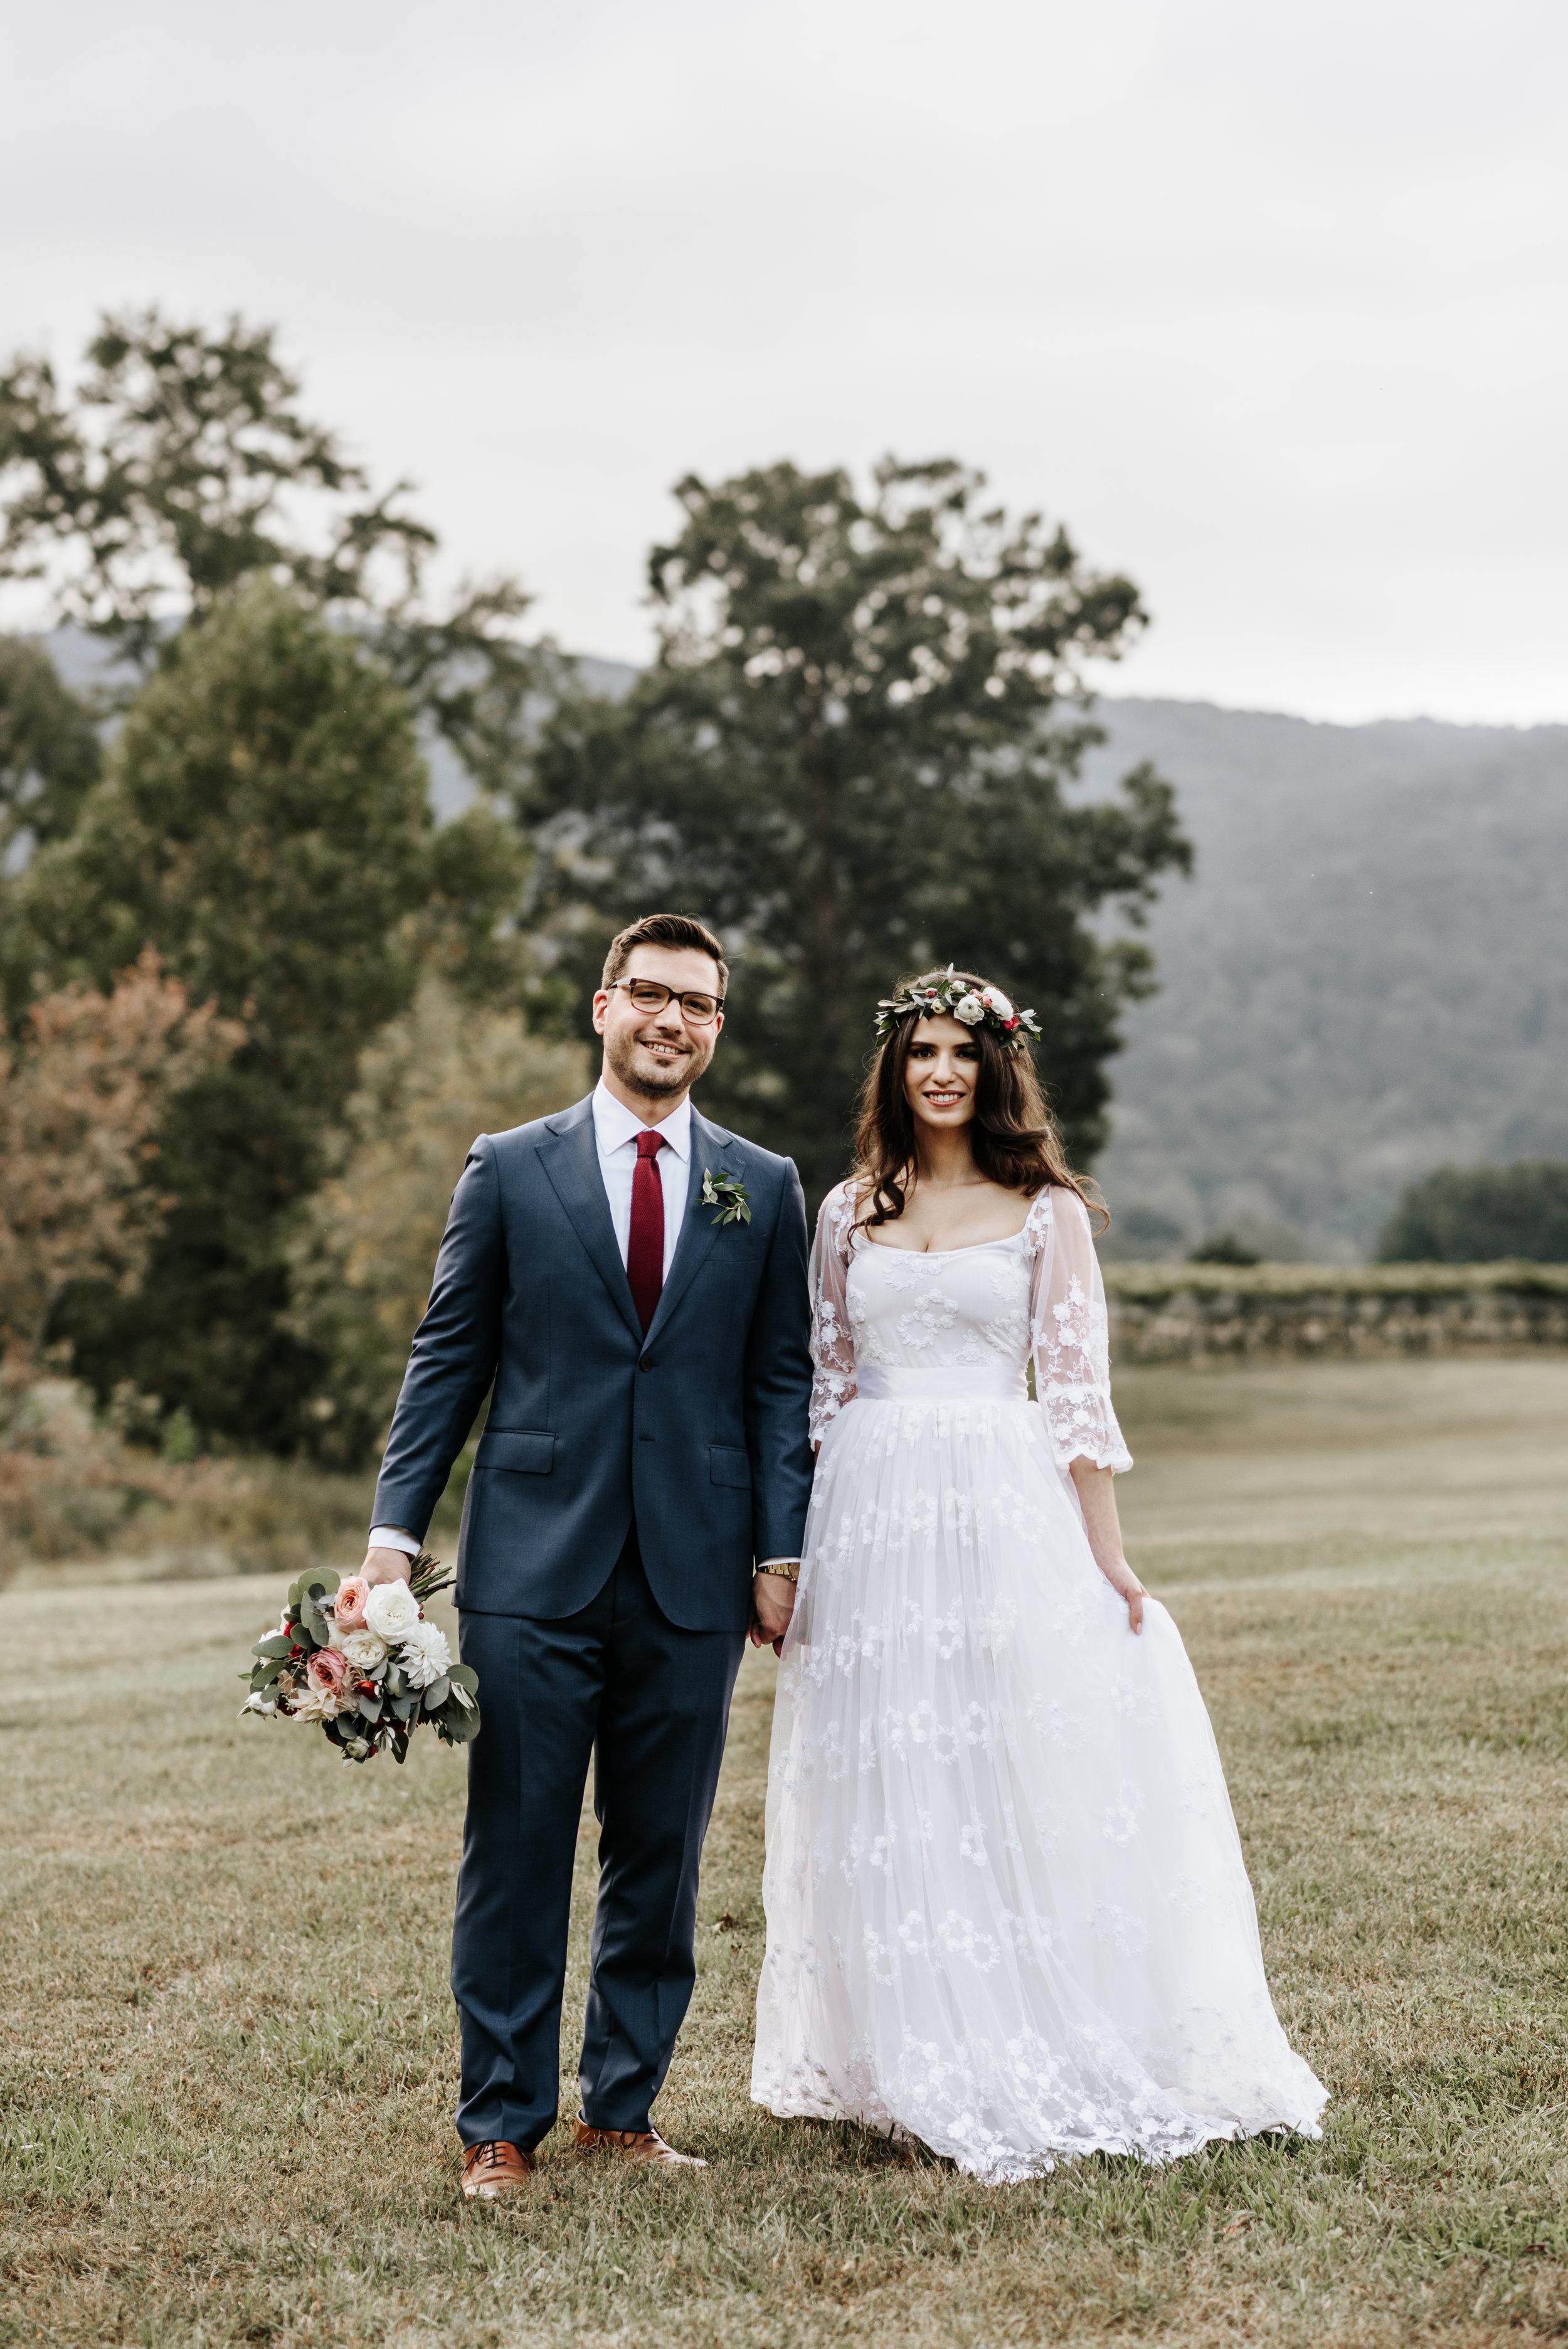 Veritas-Vineyards-and-Winery-Wedding-Photography-Afton-Virginia-Yasmin-Seth-Photography-by-V-2316.jpg